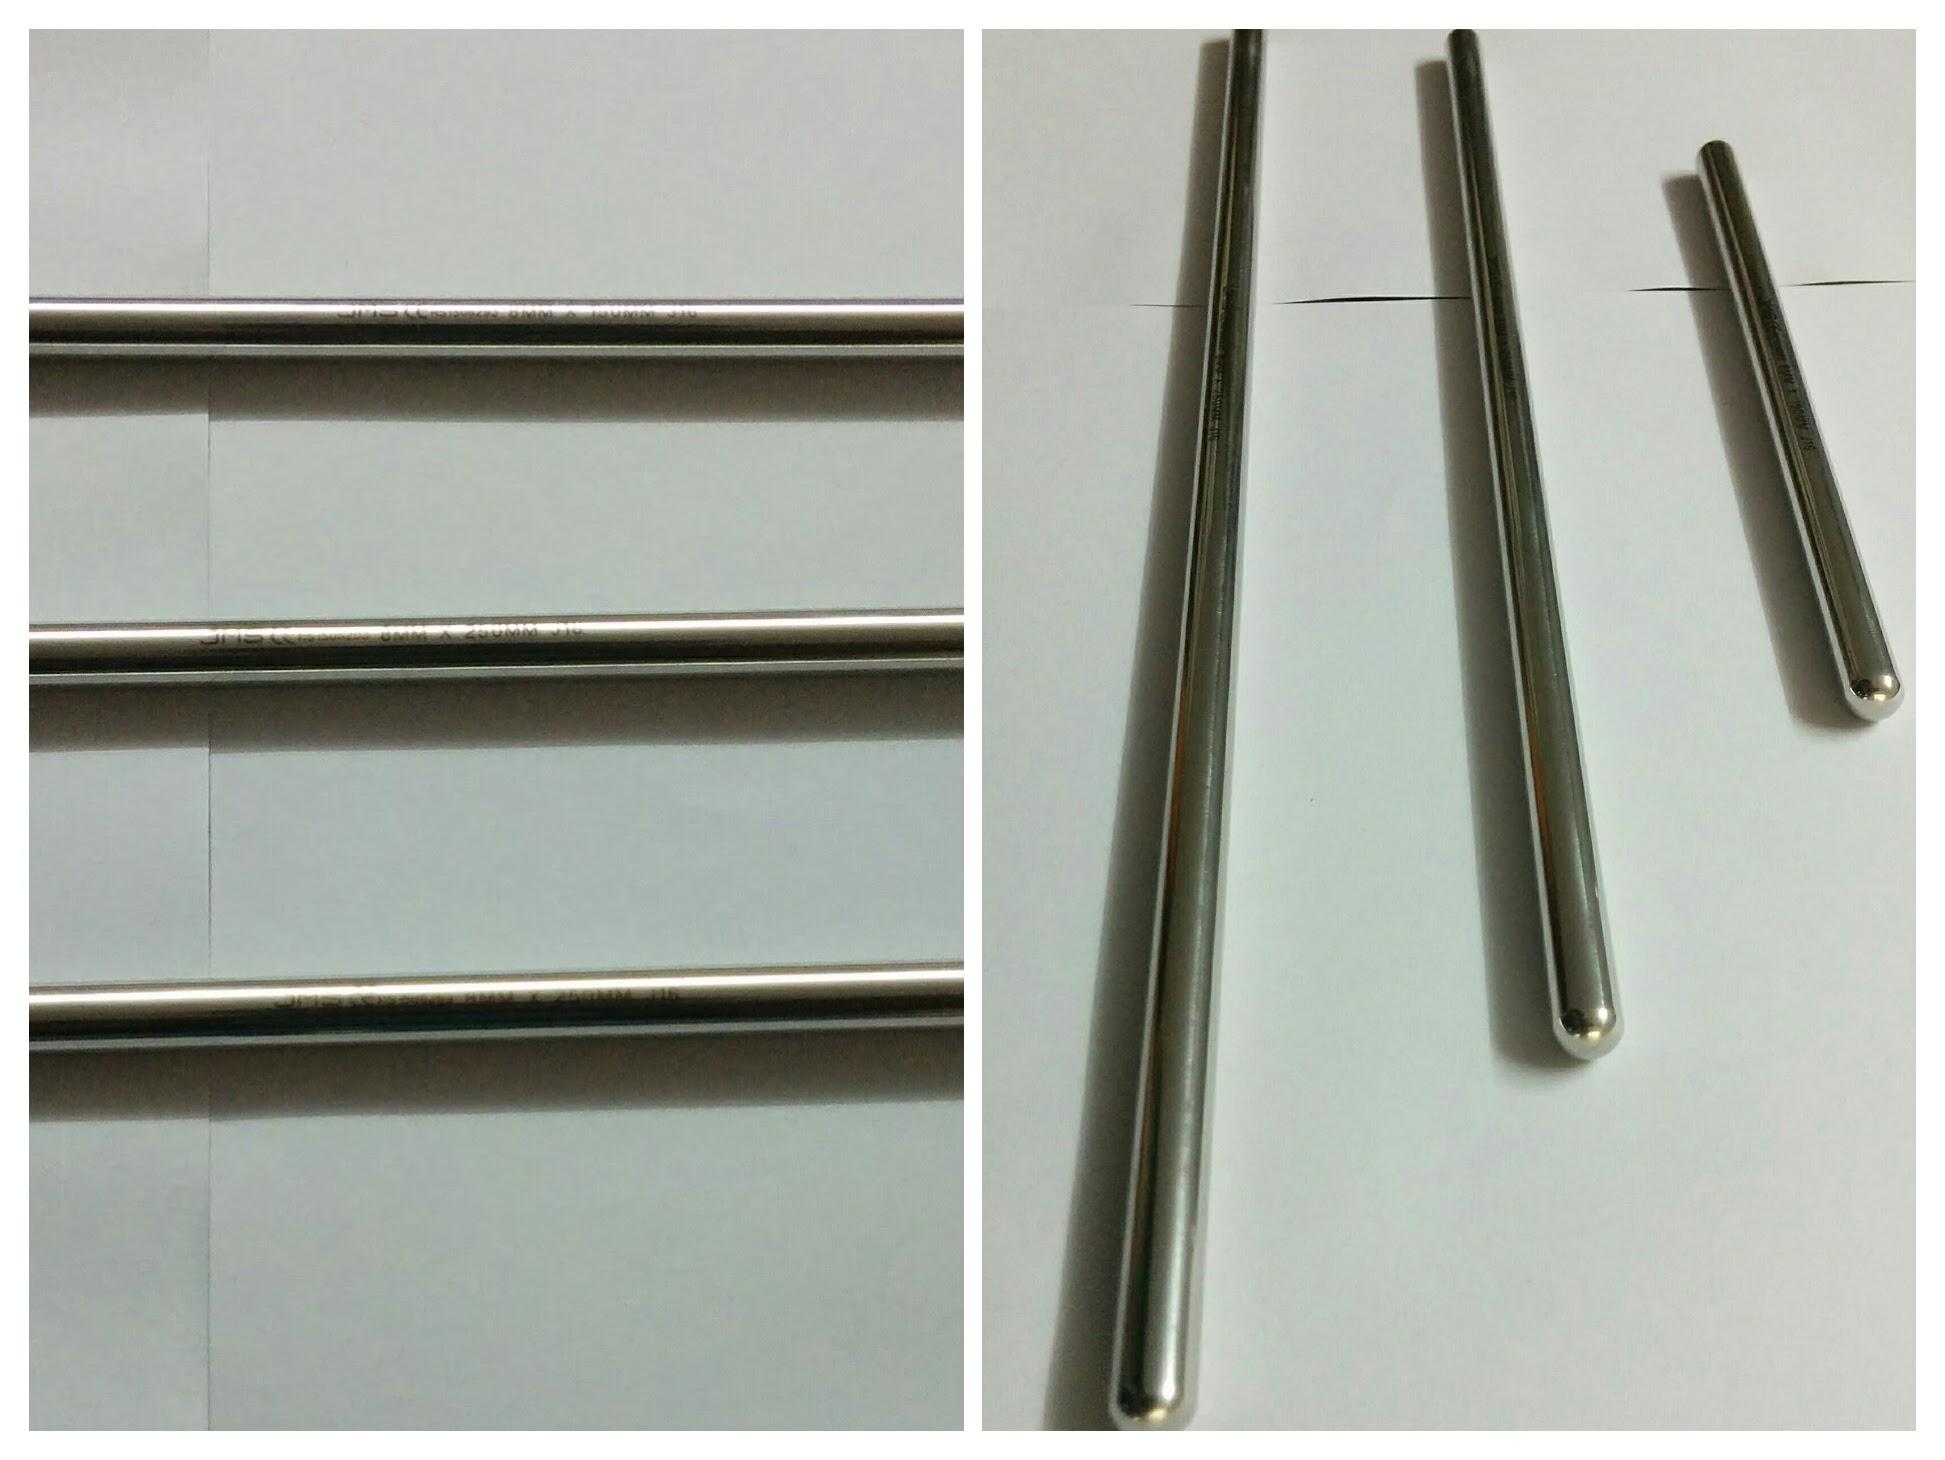 Connecting Rod Orthopedic External Fixator